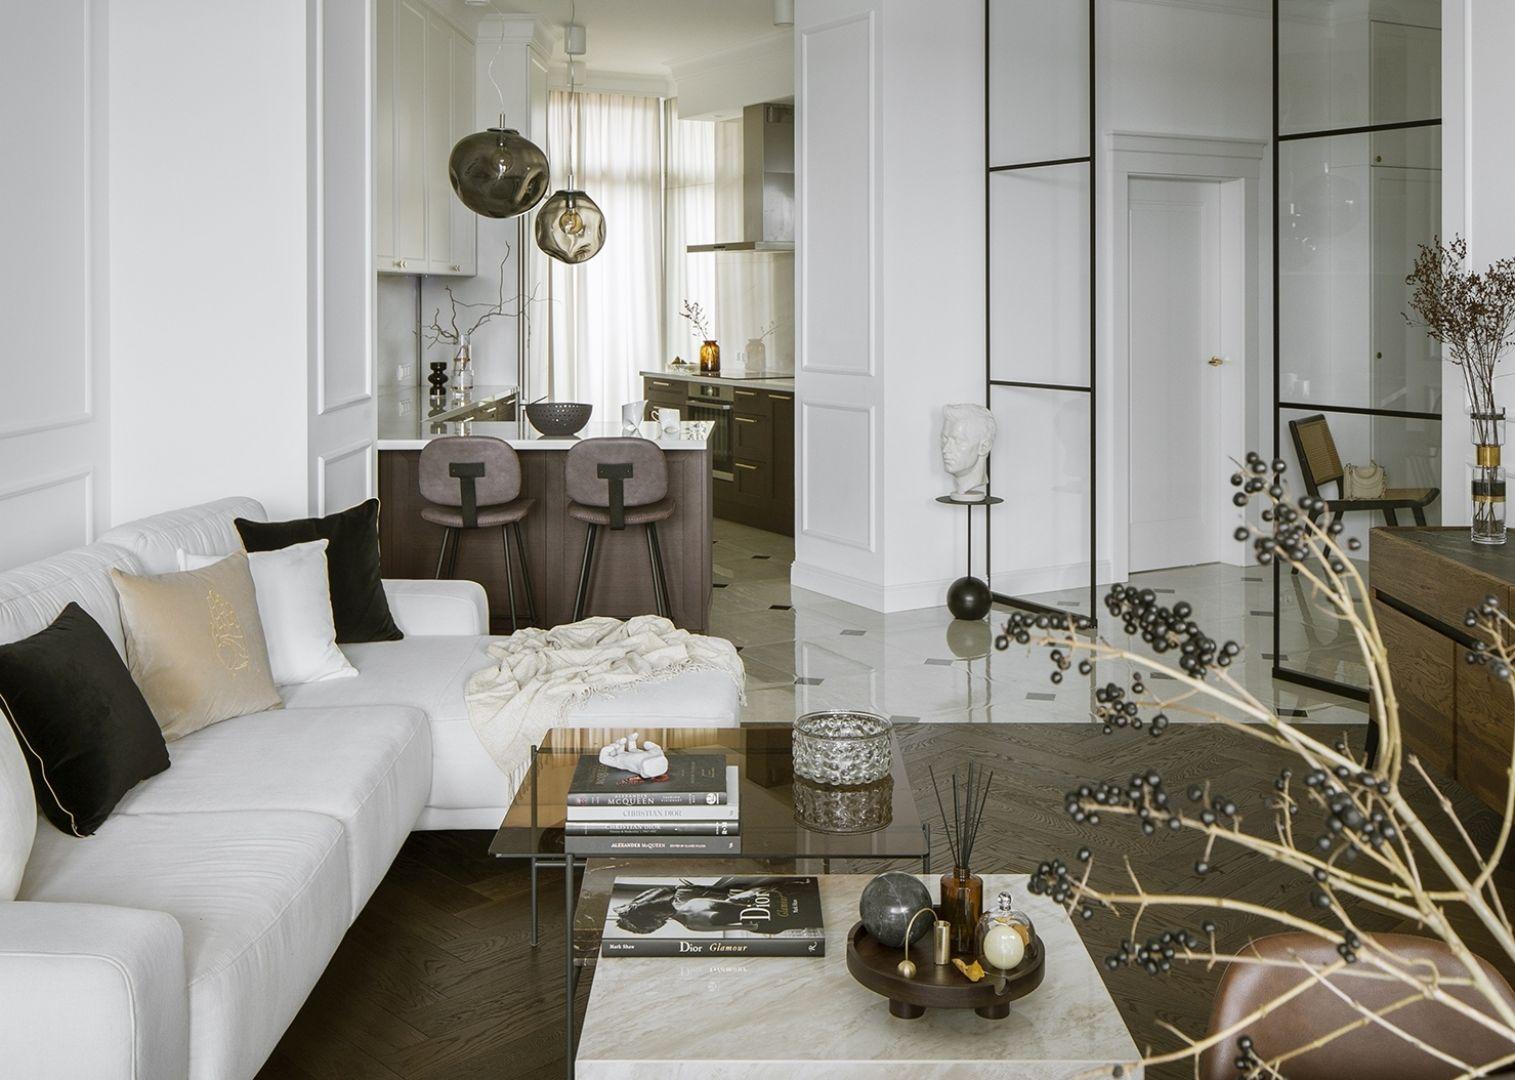 Projekt Kate&Co. Mieszkanie Koneser. Fot.YassenHristov